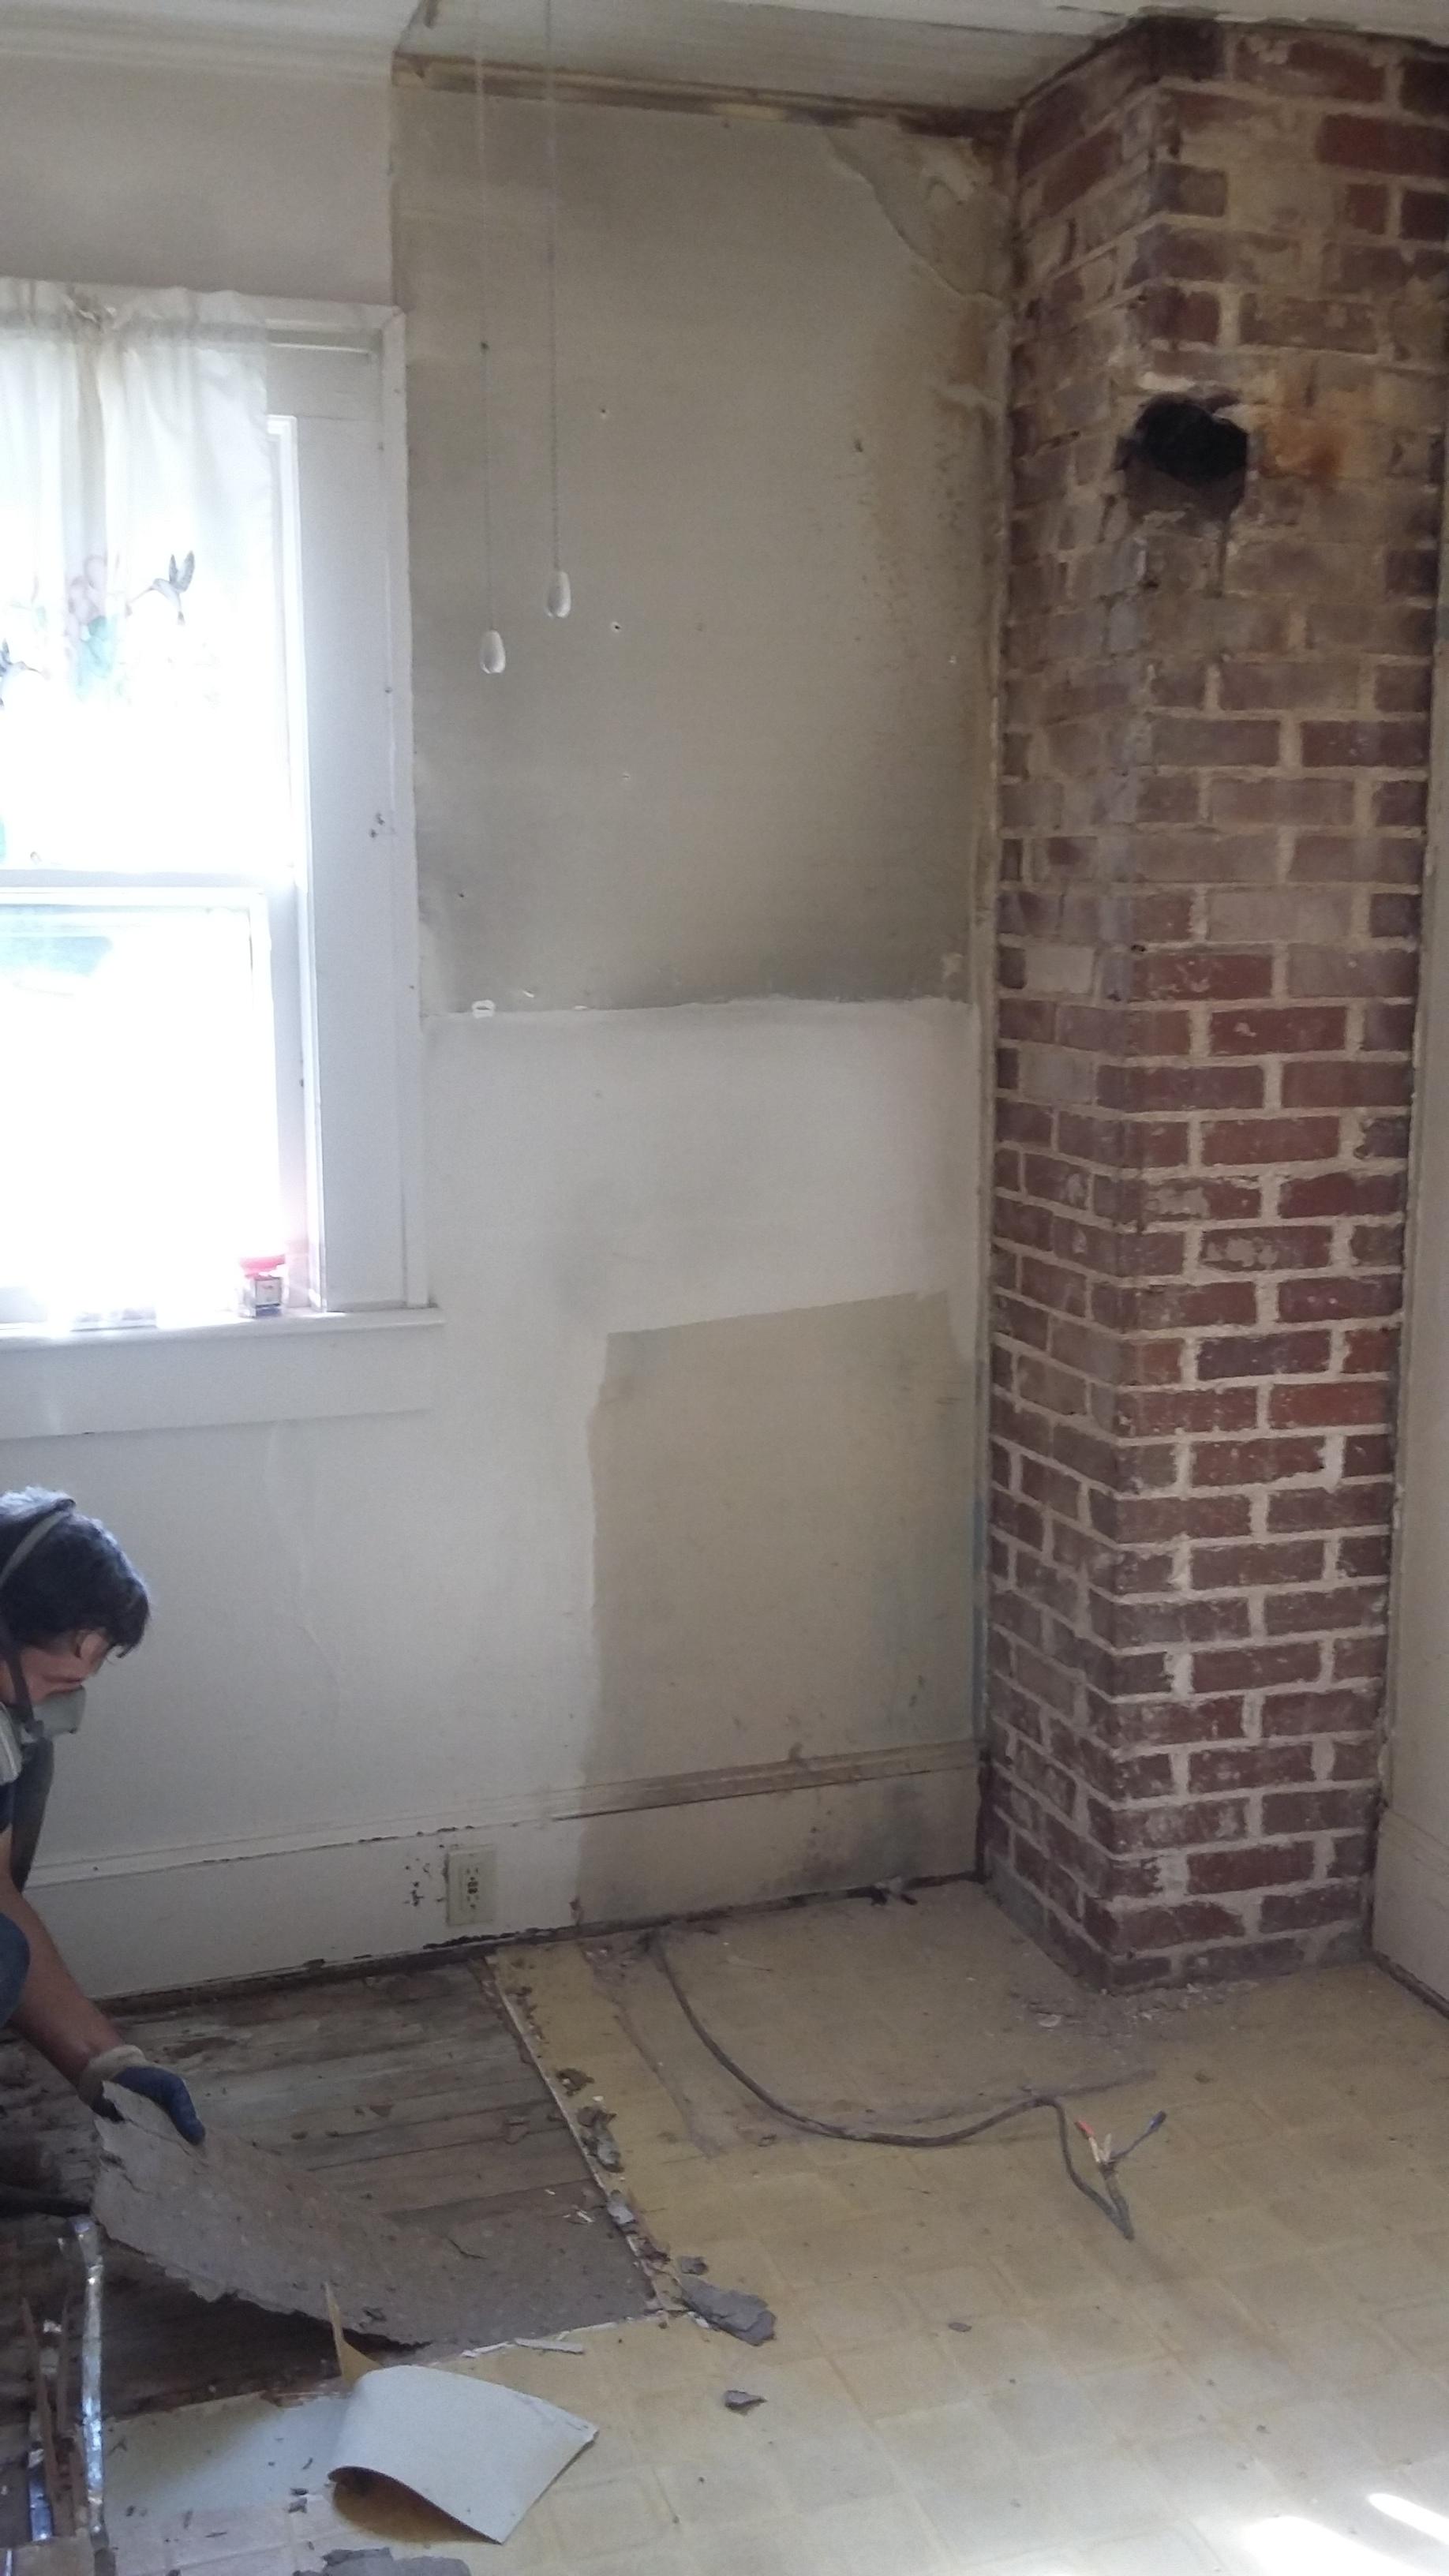 House Flipping - Exposing Brick Chimney   Elizabeth Burns Design